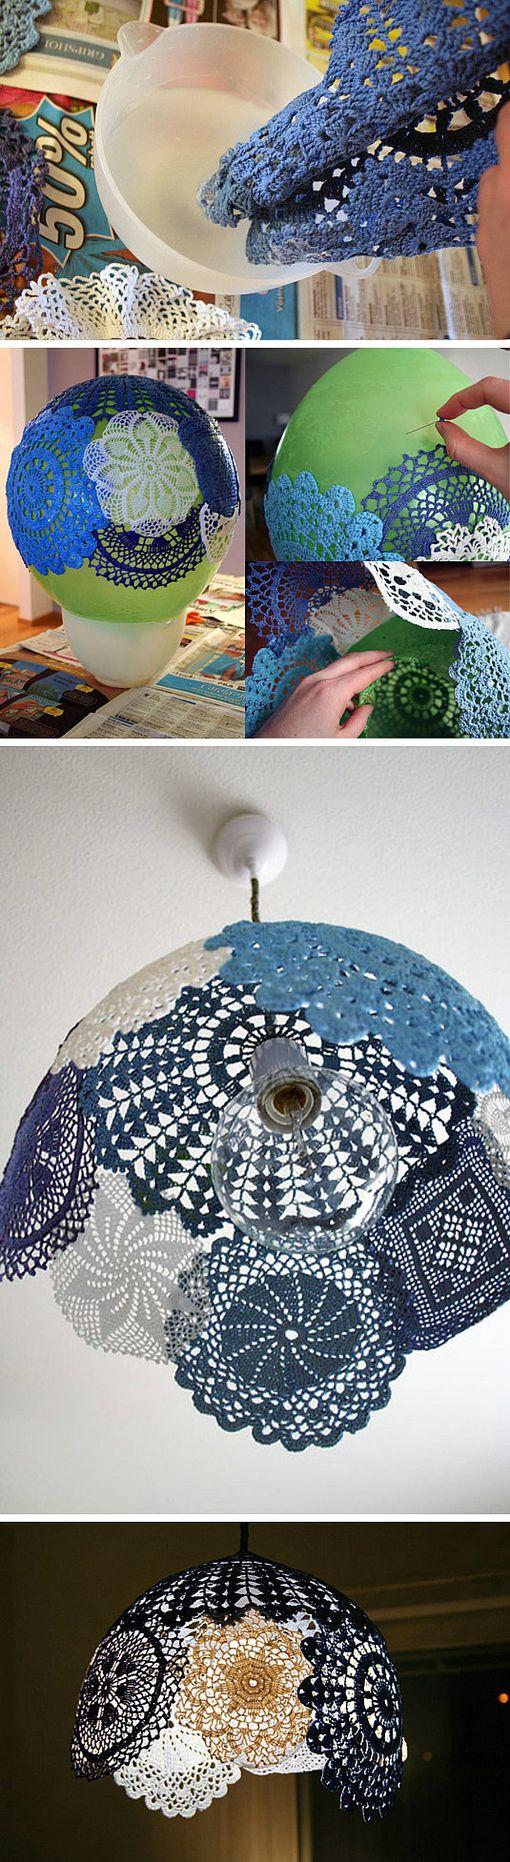 cool lampshade ideaLights Fixtures, Lamps Shades, Cute Ideas, Doilies Lamps, Cool Ideas, Lampshades Ideas, Lamp Shades, Diy, Crafts